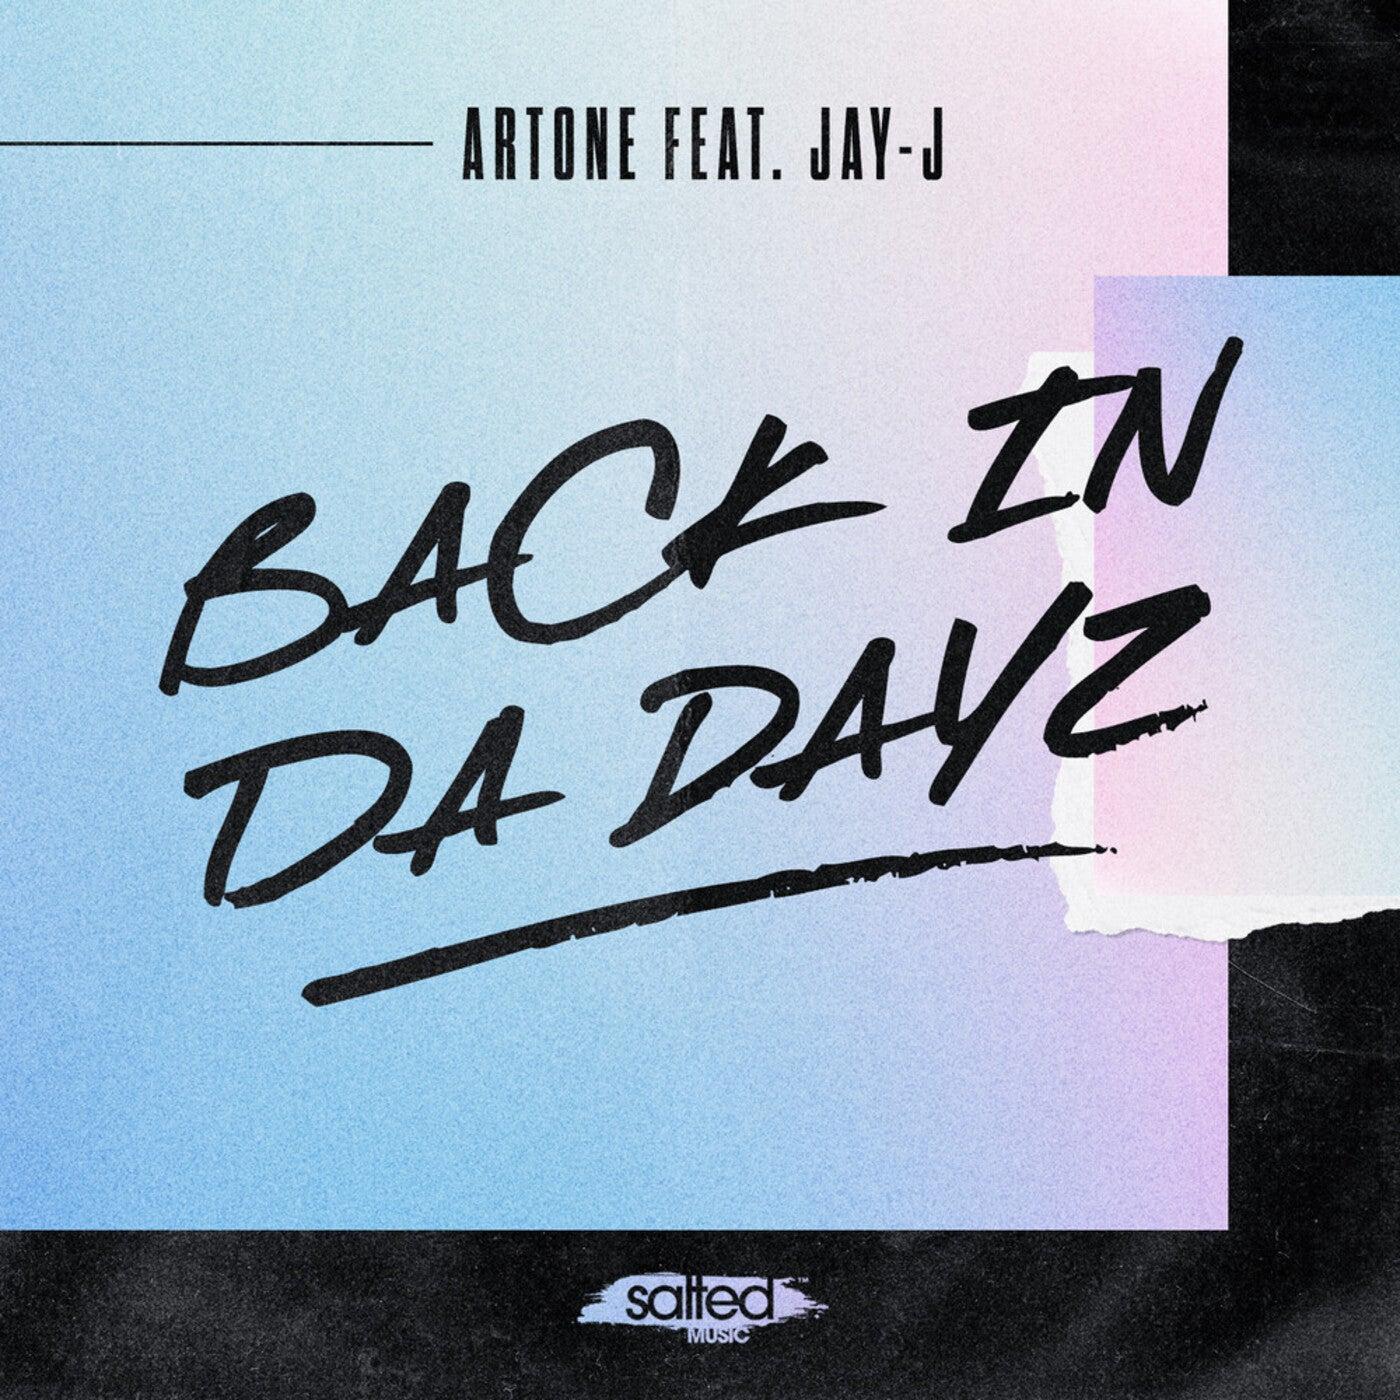 Back In Da Dayz feat. Jay-J (Dutchican Soul Remix)